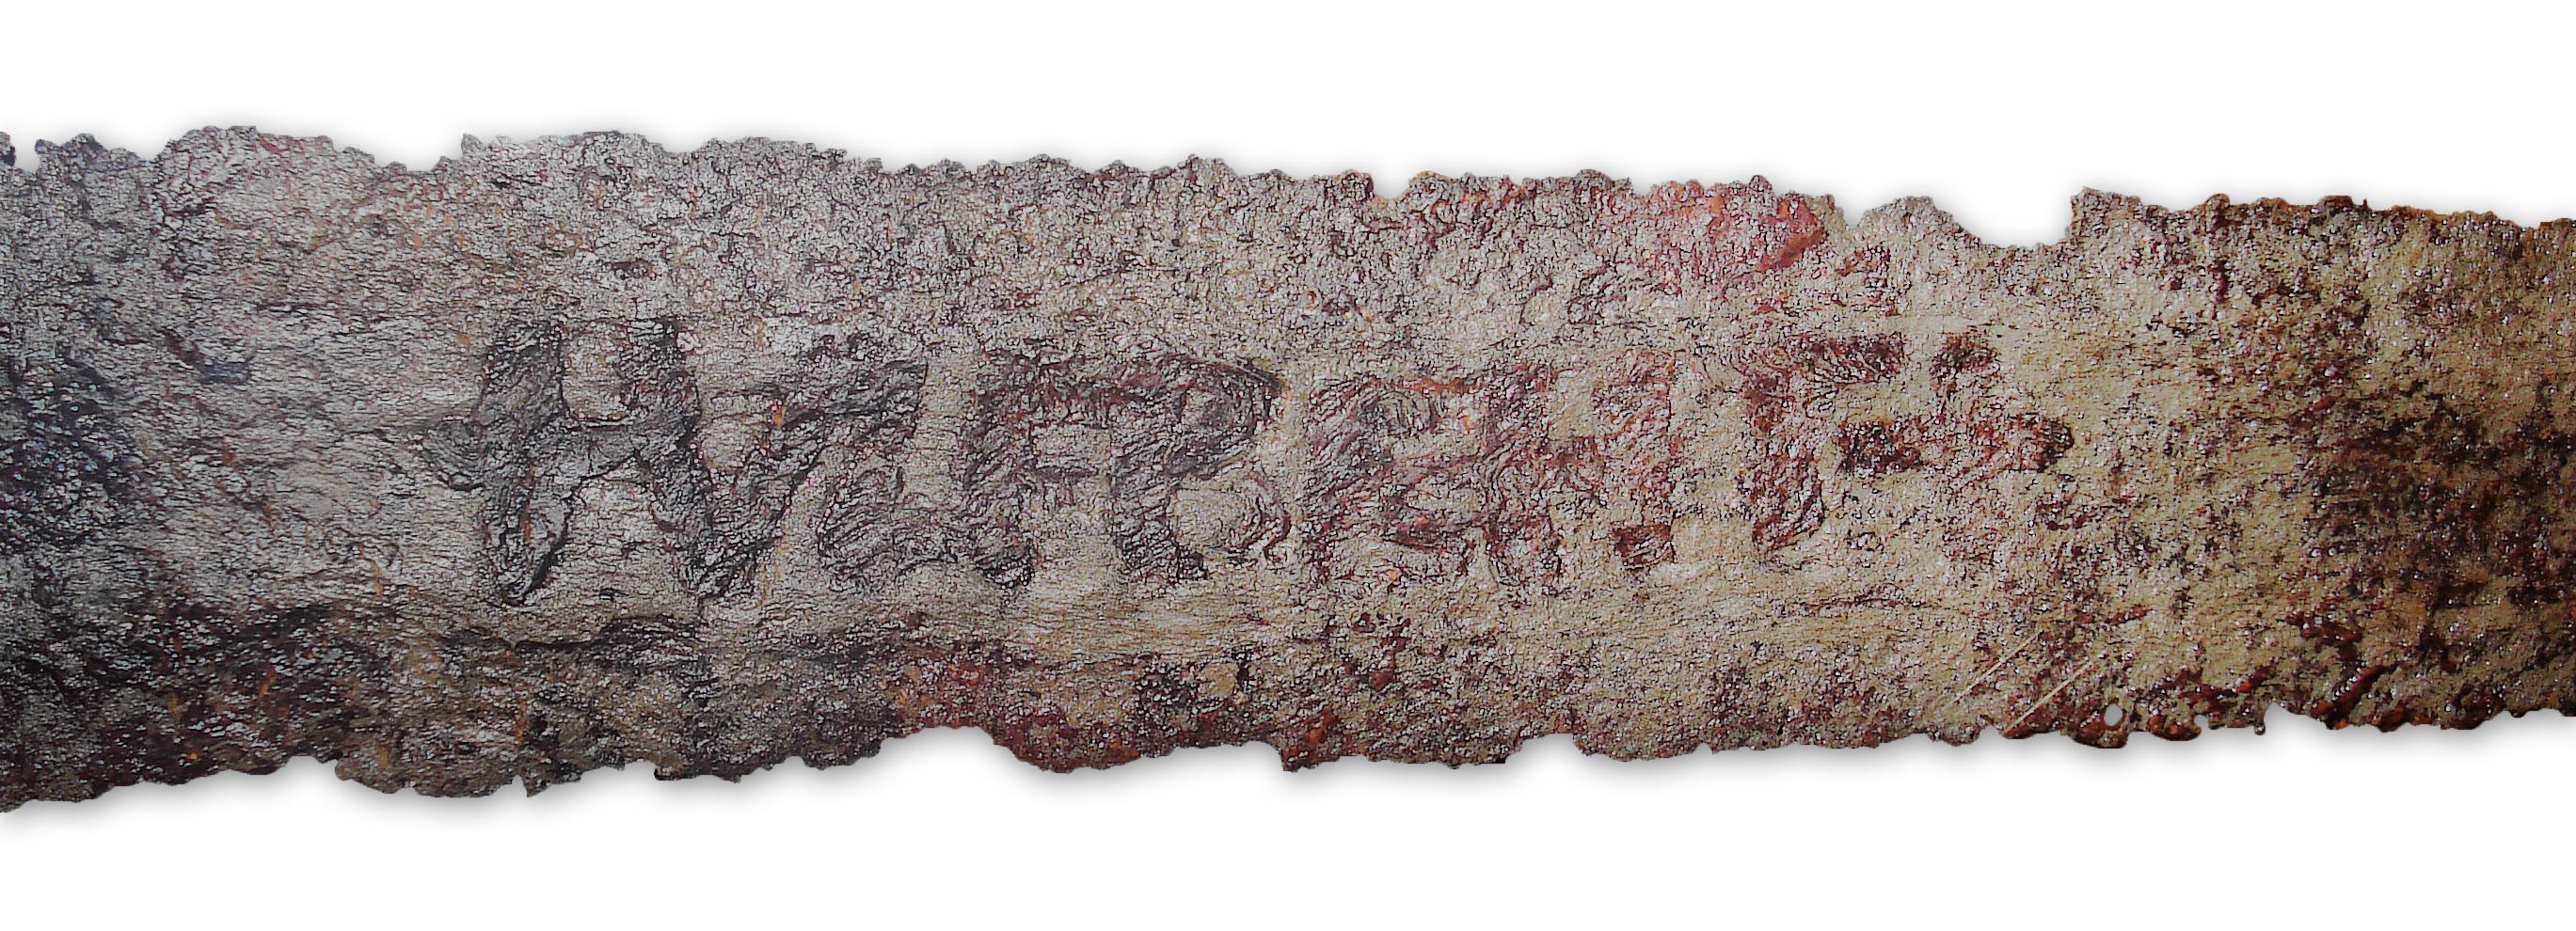 Spatha, sog. Ulfberht-Schwert, aus dem Rhein bei Mannheim, 1. Hälfte 9. Jh., Germanisches Nationalmuseum Nürnberg (FG 2187). Quelle: de.wikipedia.org, User: Martin Kraft.